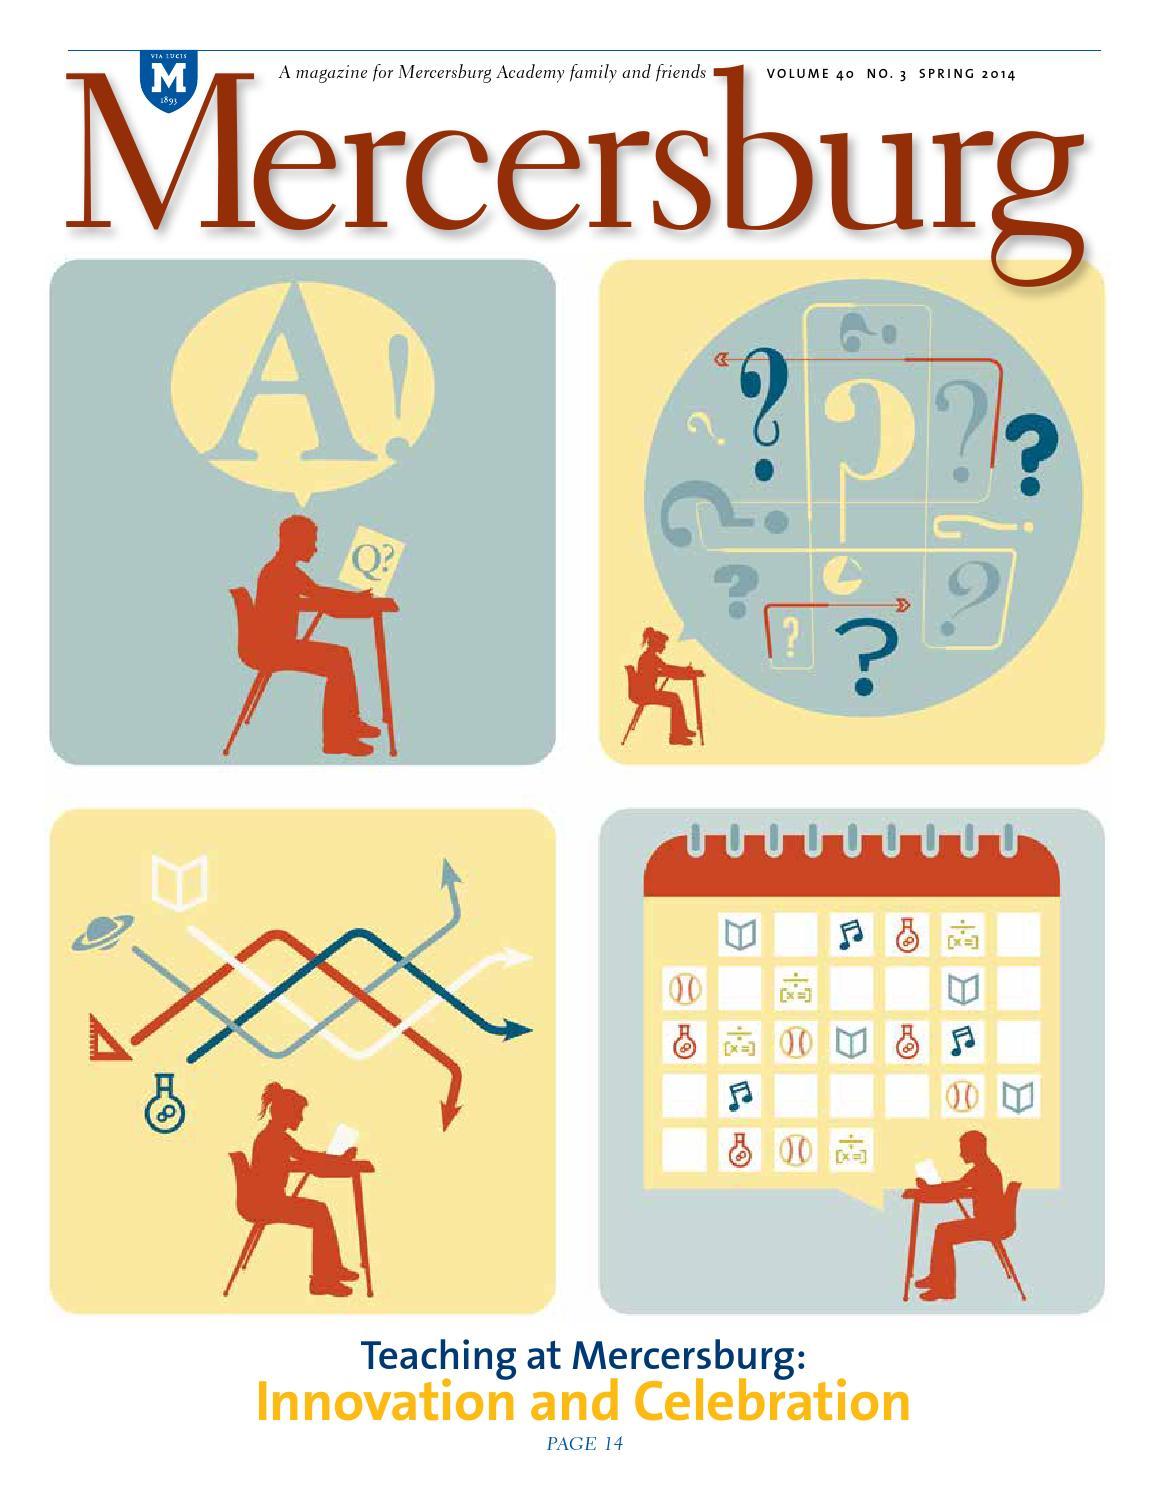 Mercersburg magazine spring 2014 by mercersburg academy issuu fandeluxe Image collections